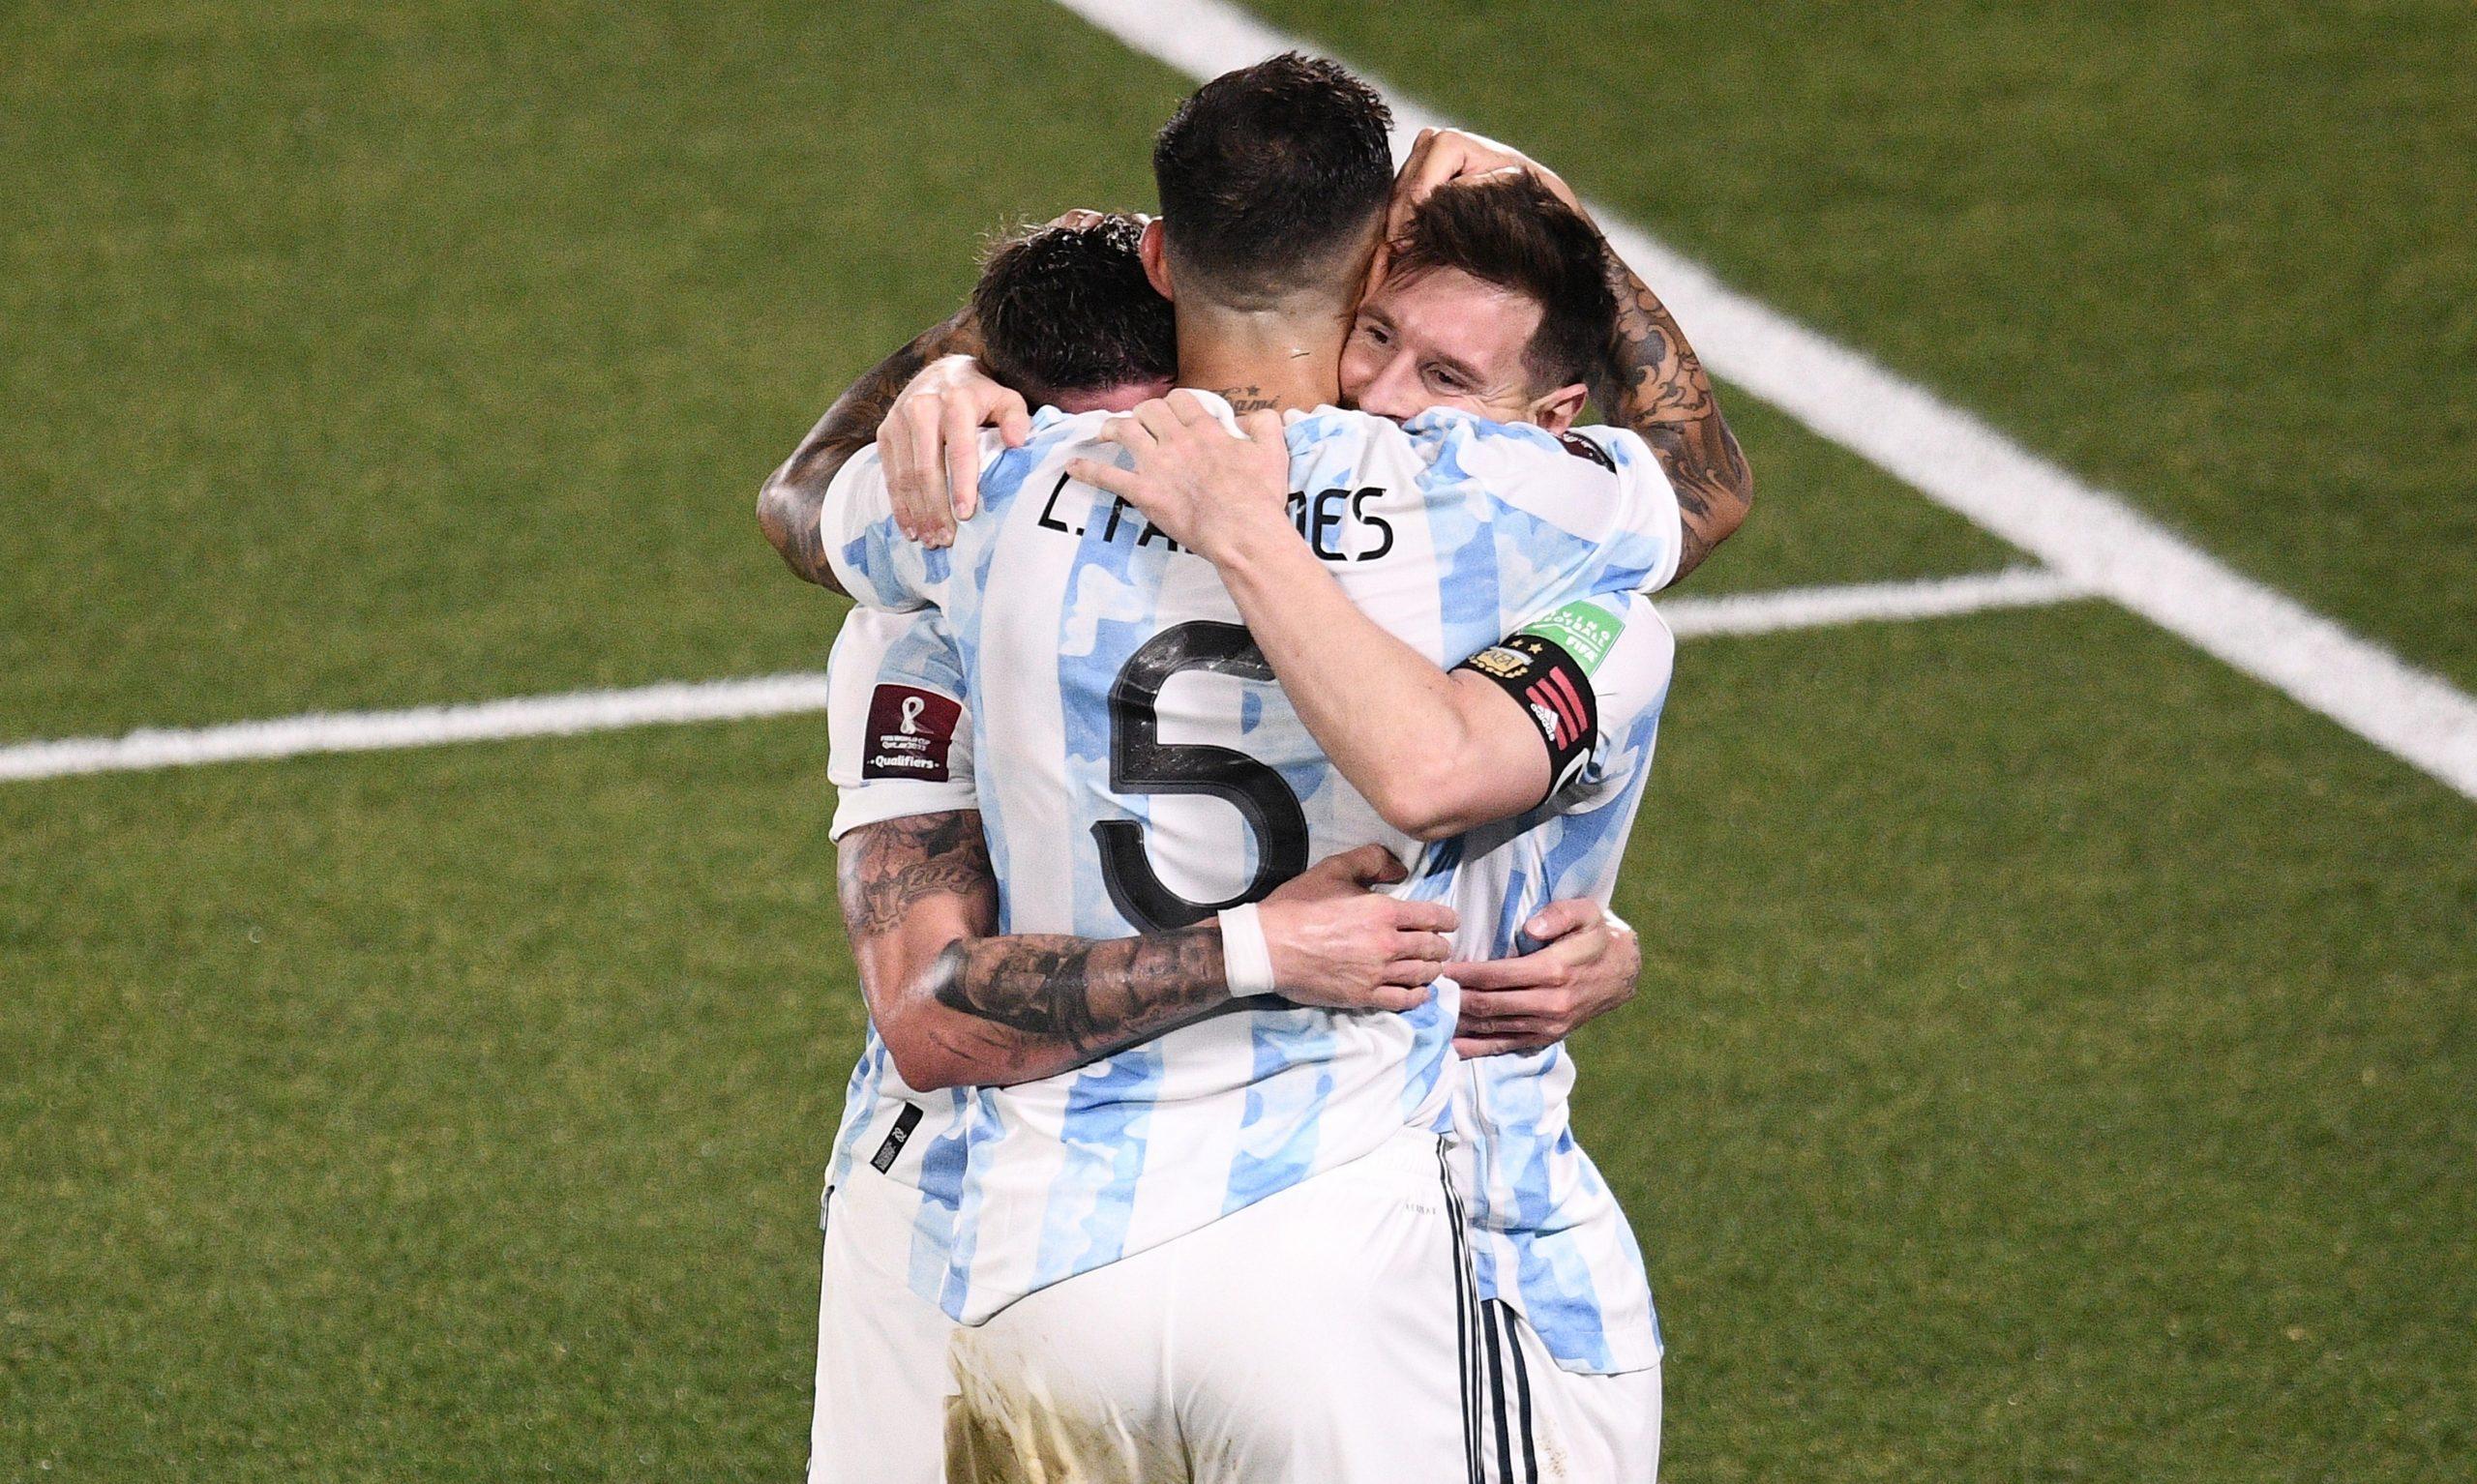 Argentina vence 3-0 a Uruguay, Messi llega a 80 goles con la Albiceleste - Prensa Libre